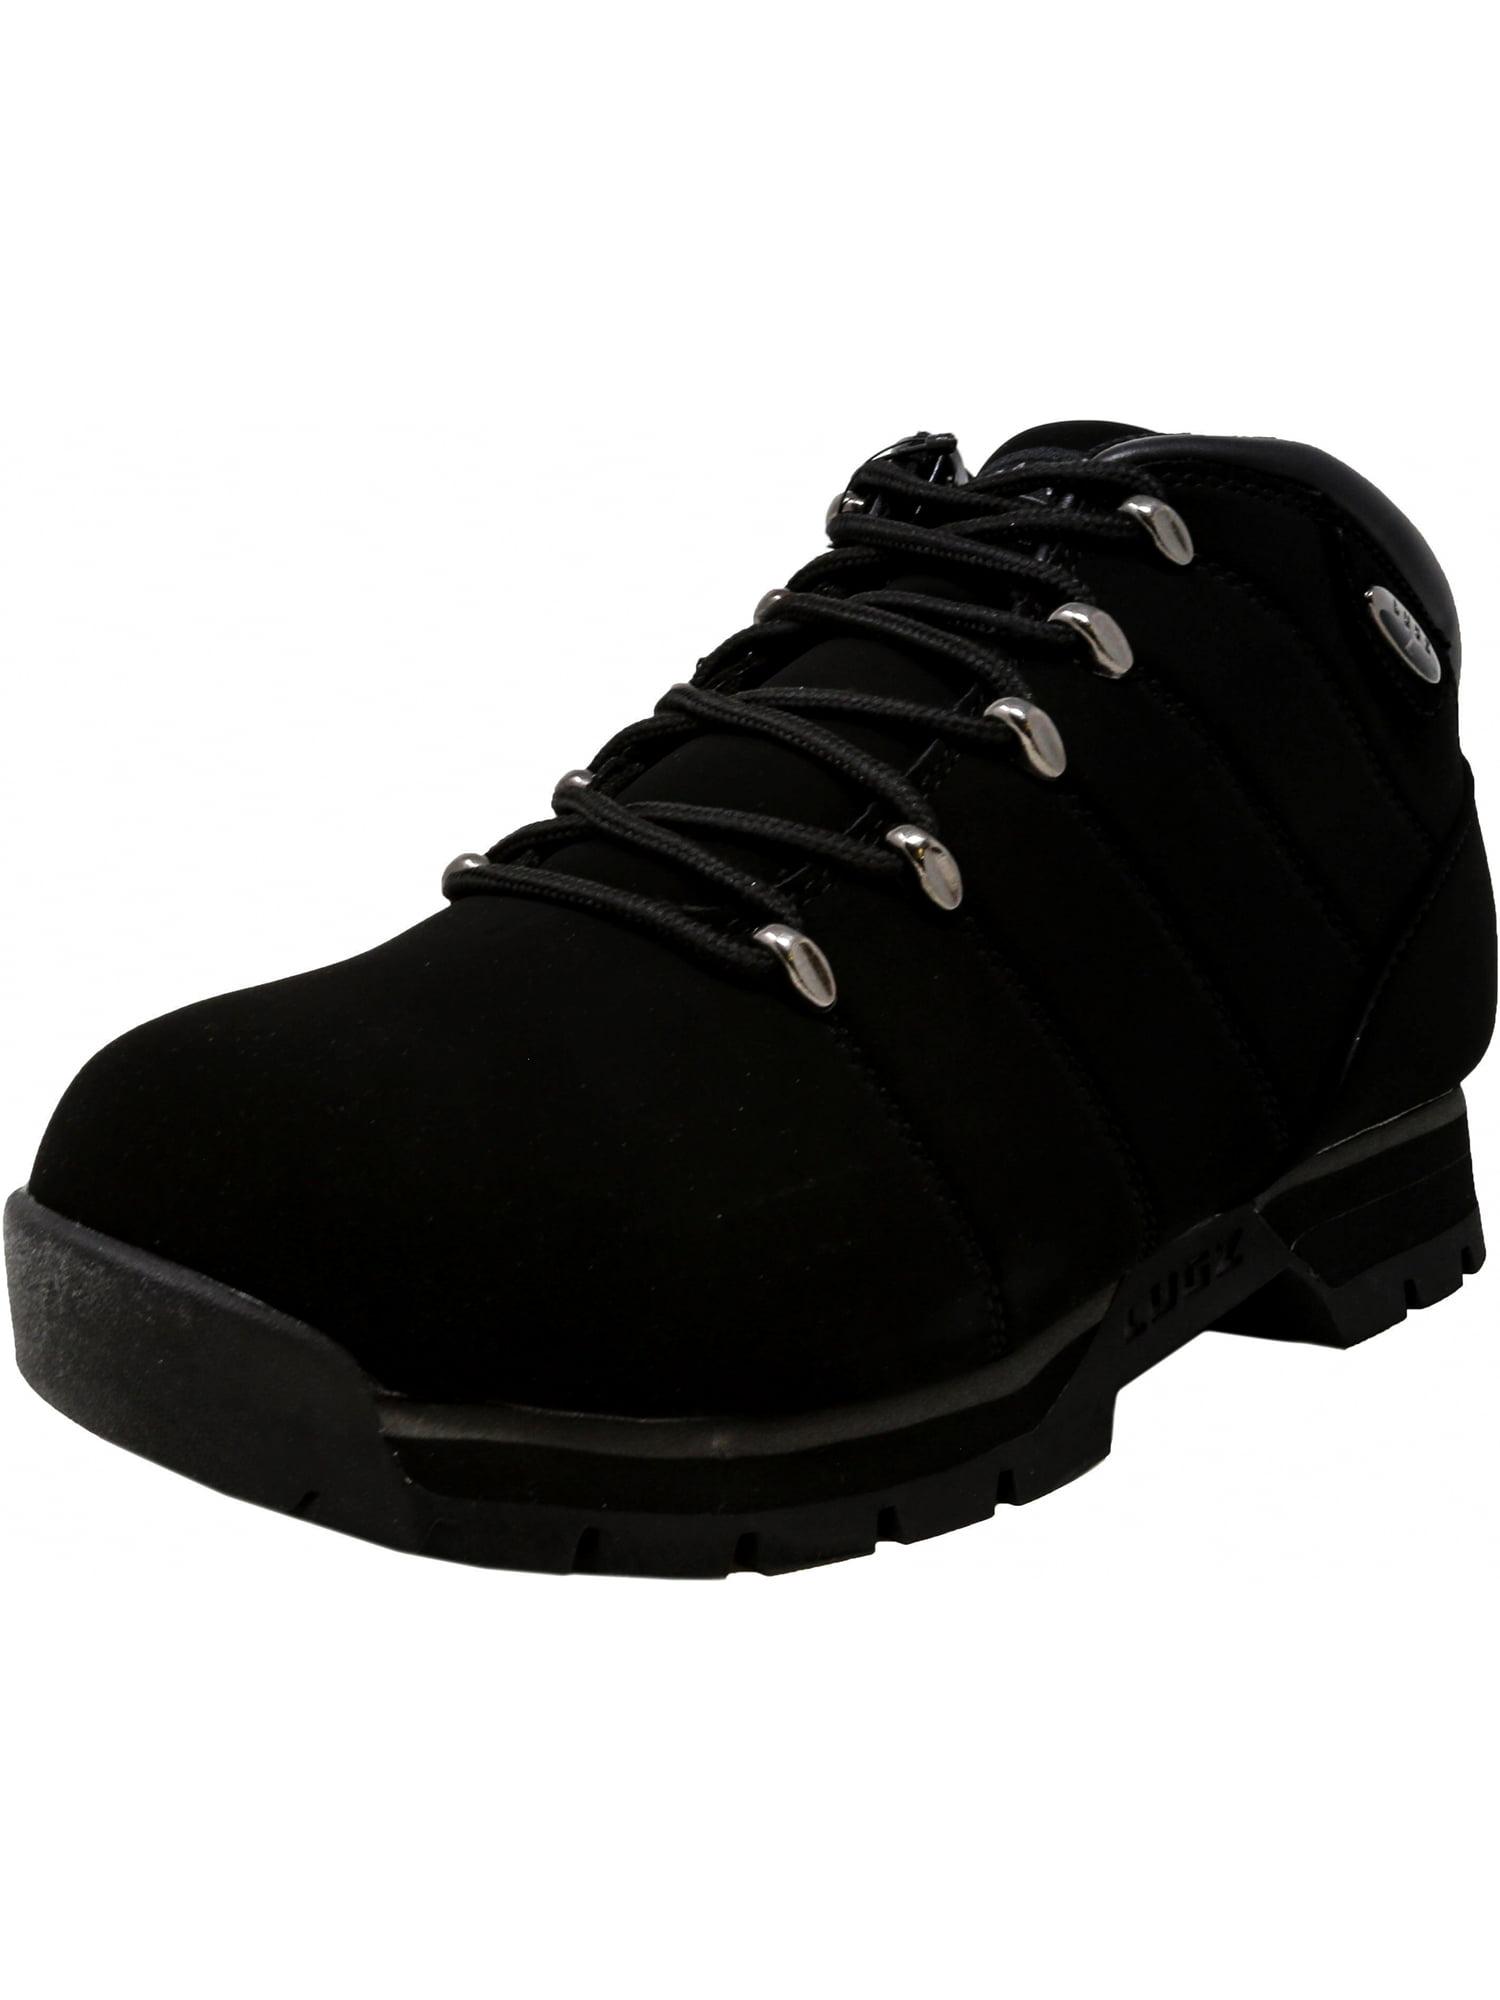 Lugz Men's Jam Iii Black   Charcoal High-Top Boot 8.5M by Lugz